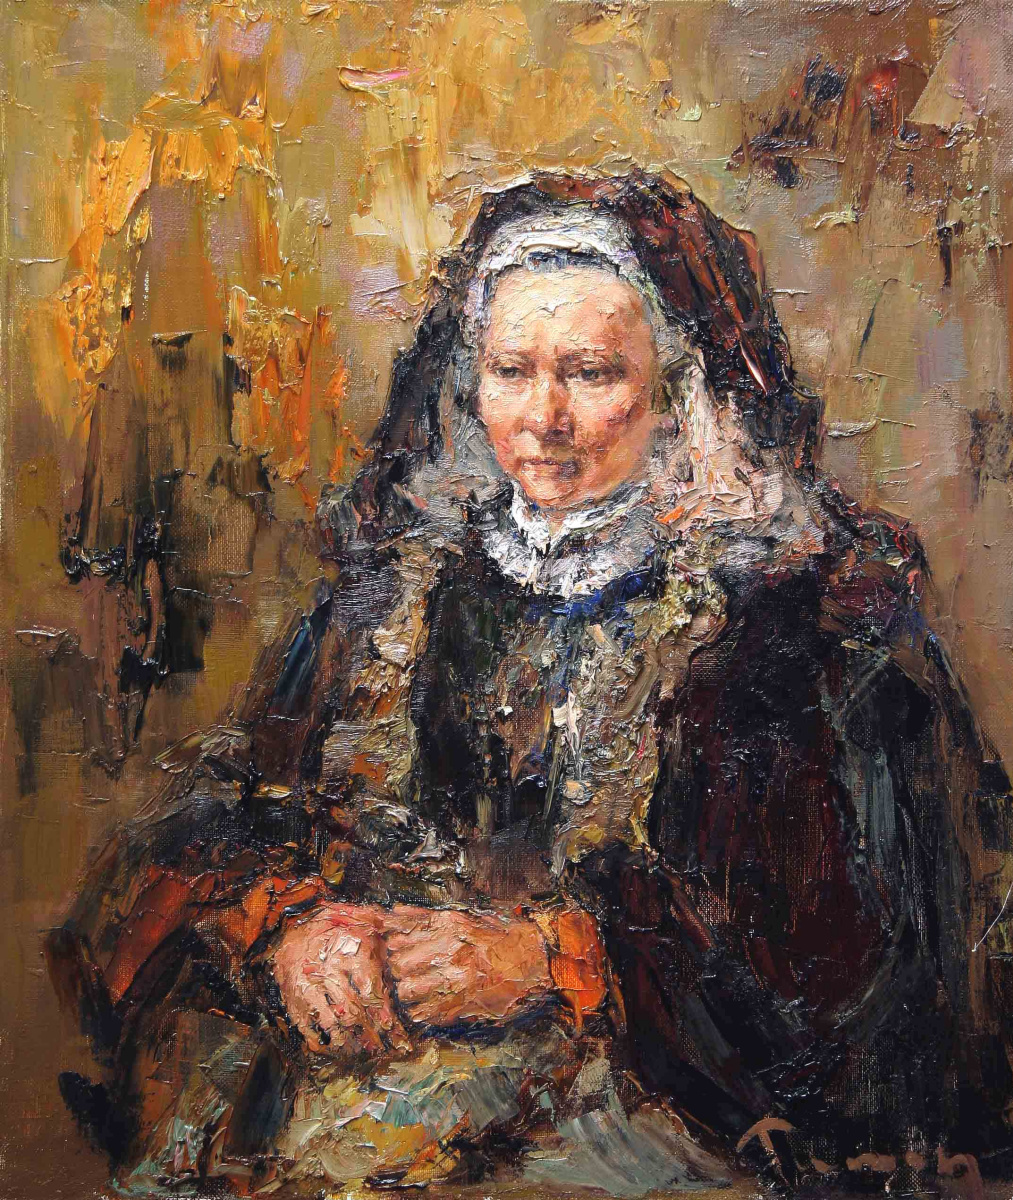 Tuman Art Gallery Tumana Zhumabayeva. Portrait of an elderly woman